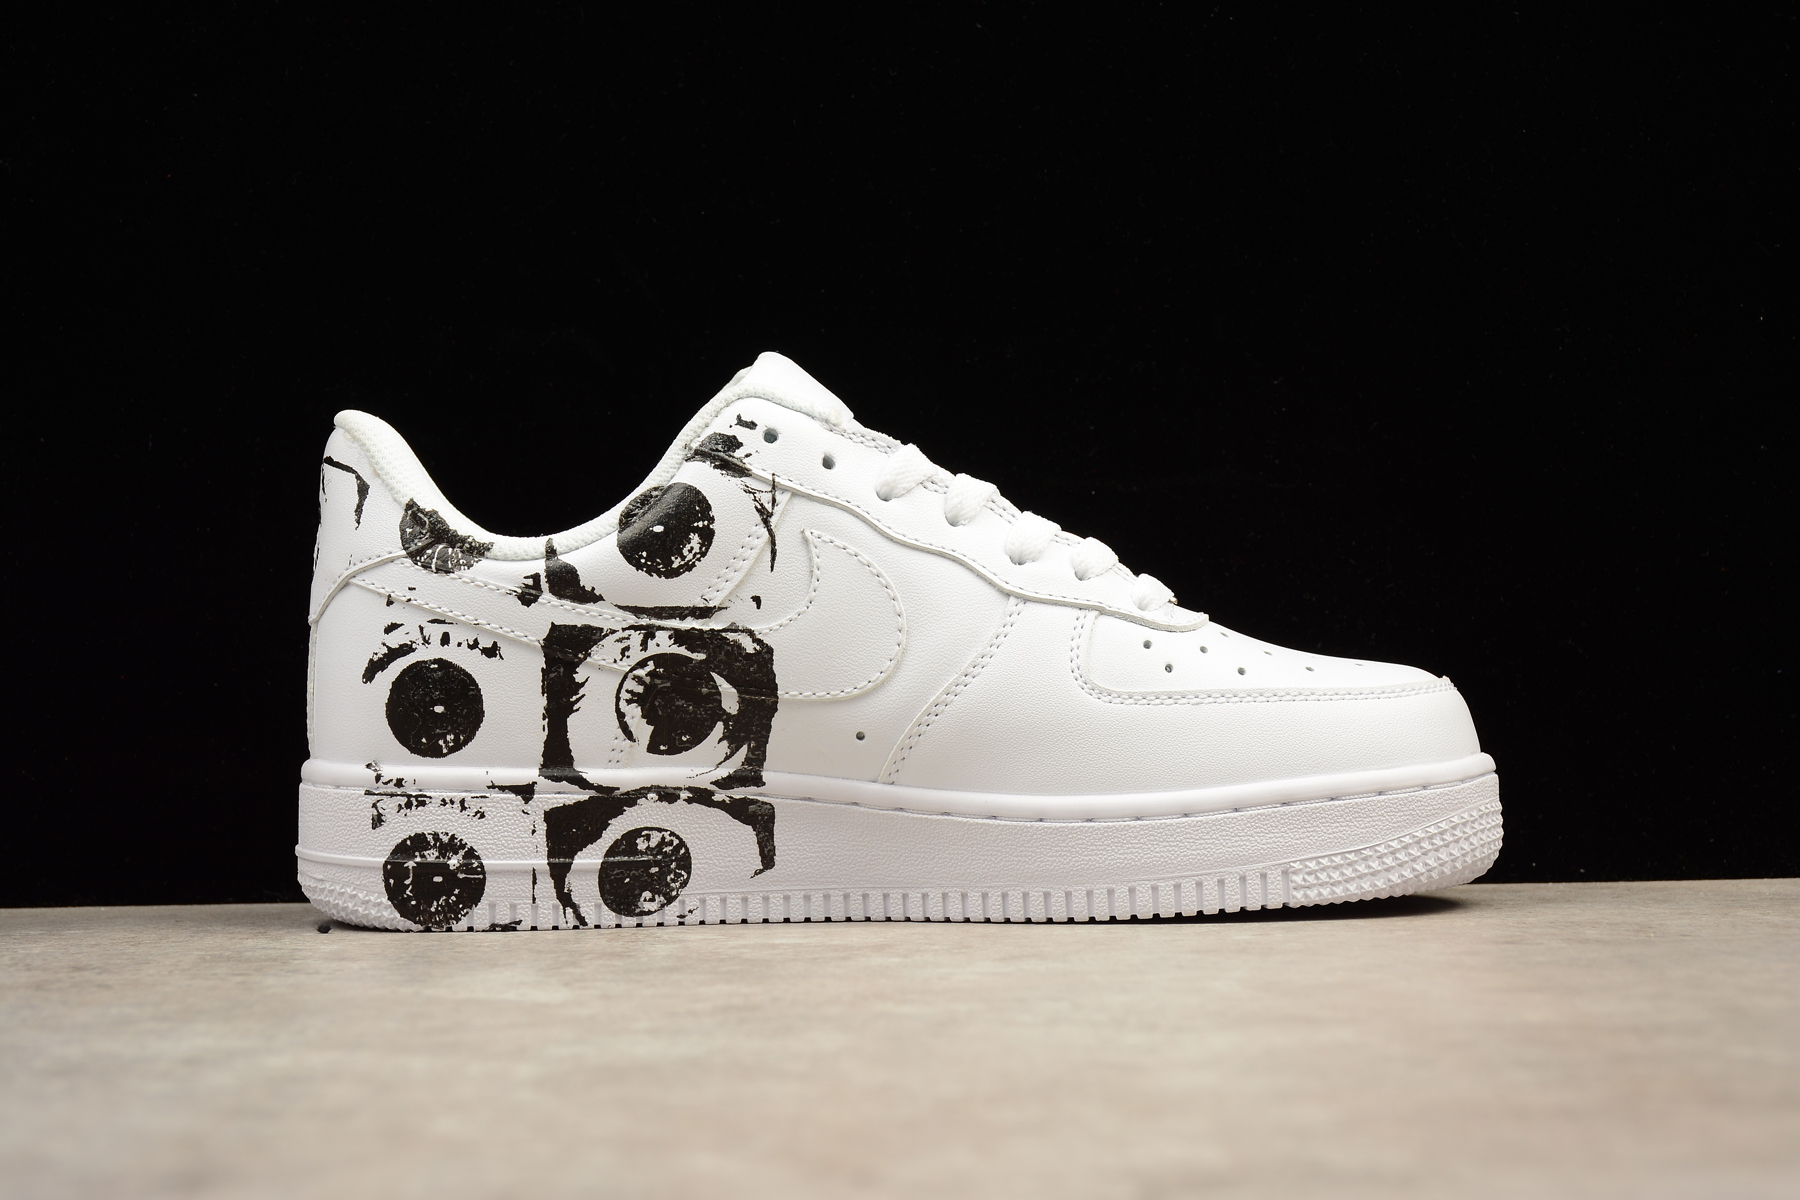 5b8cdb7b406c ... SUPREME X CDG NIKE AIR FORCE 1 AF1 Low White Casual Shoes - Thumbnail 4